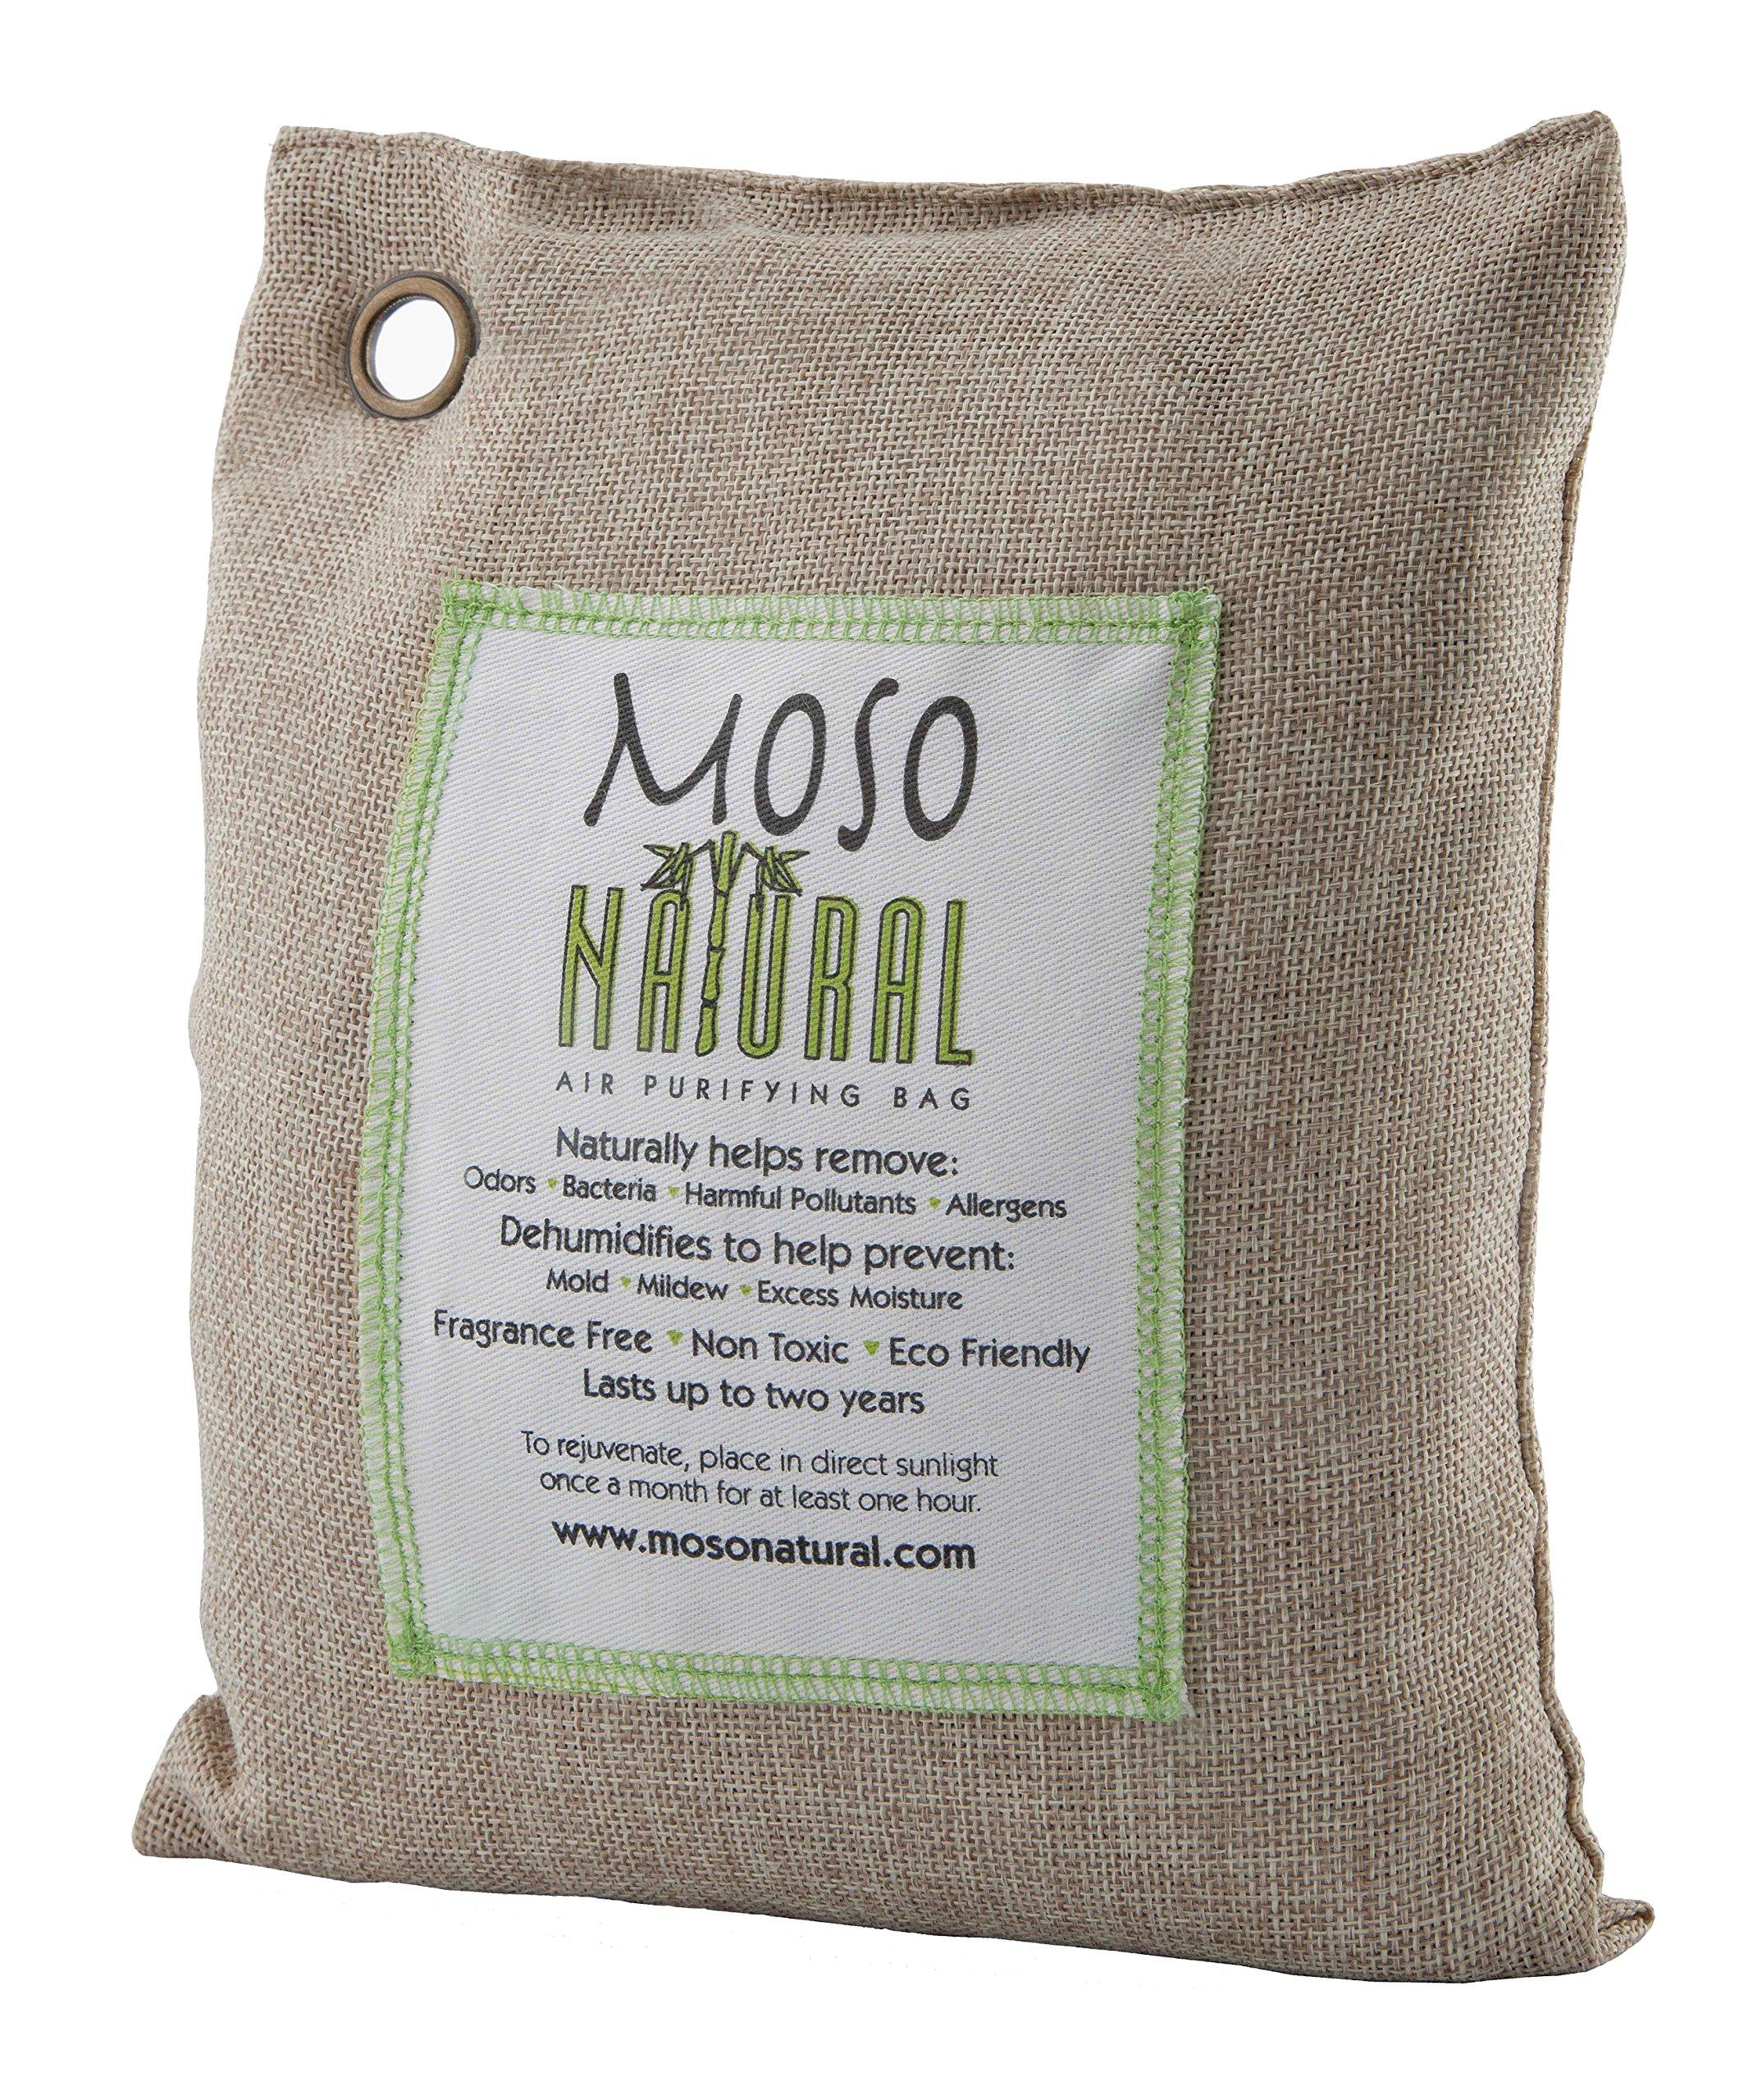 Moso Natural Air Purifying Bag 500-Grams. Natural Color. Natural Odor Eliminator. Fragrance Free, Chemical Free, Odor Absorber. Captures and Eliminates Odors.